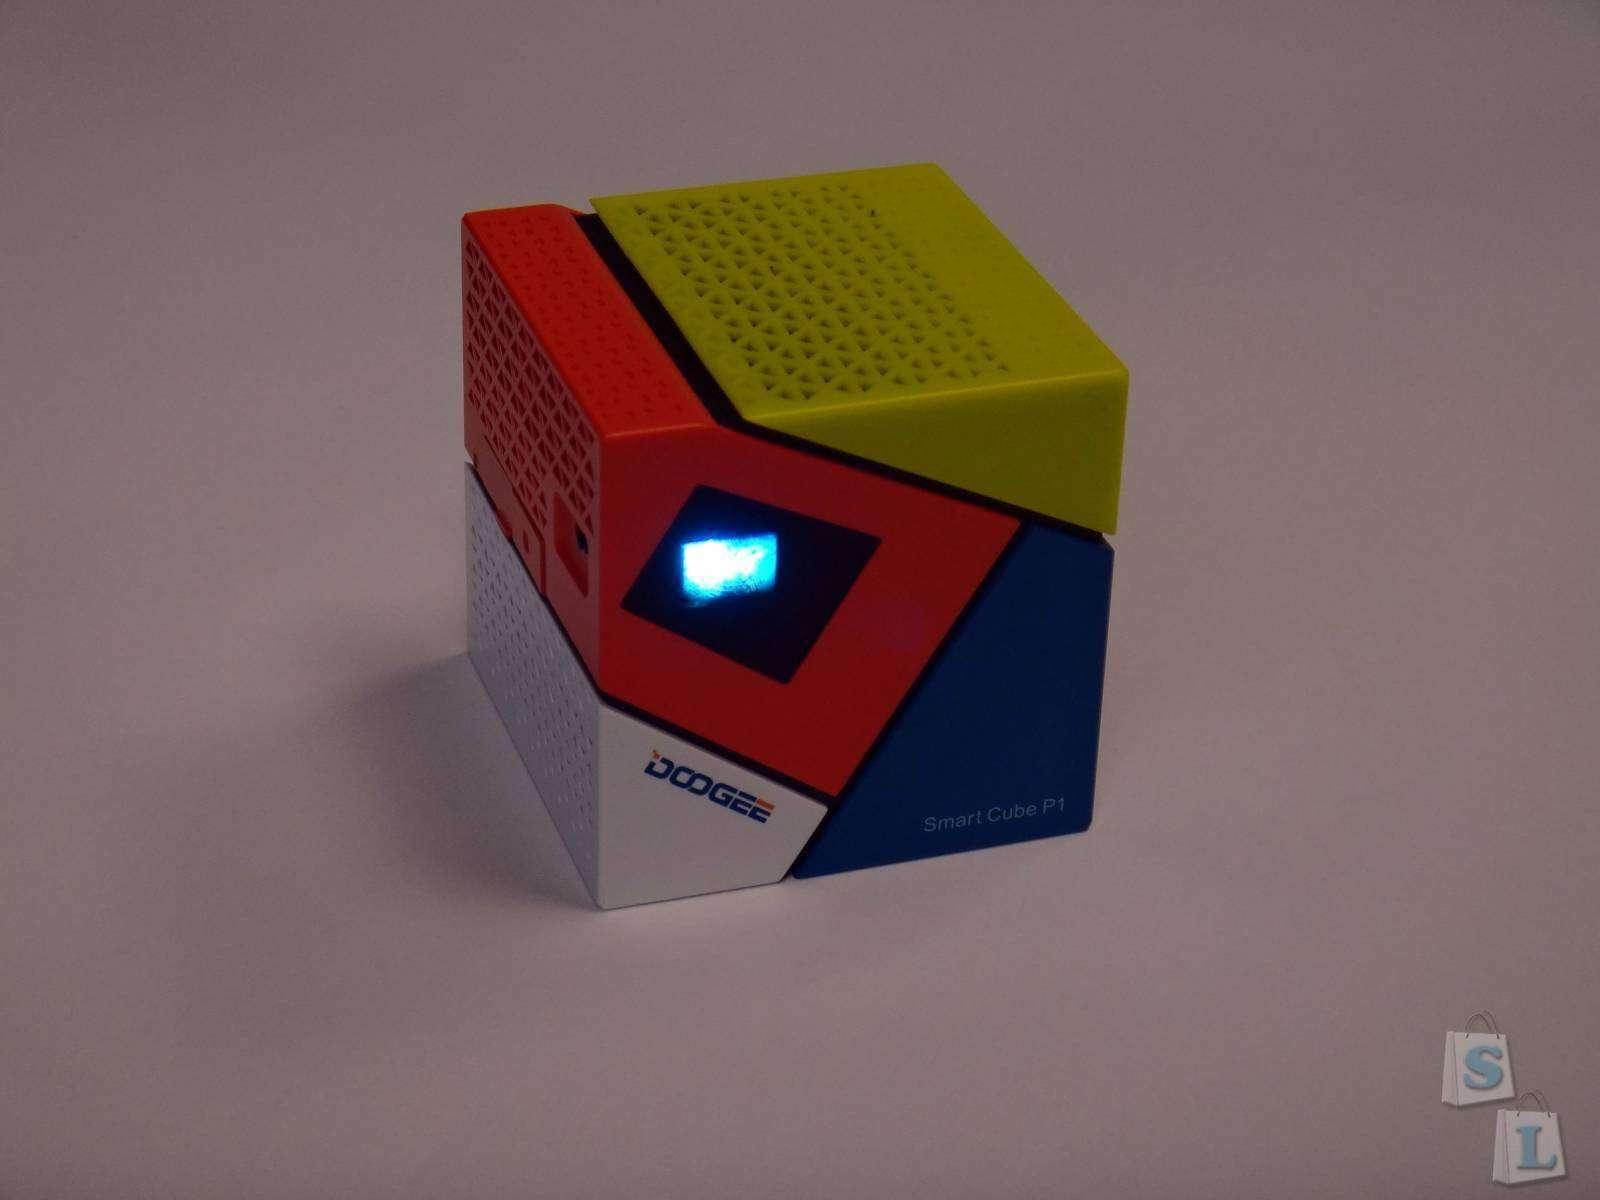 GearBest: Обзор DOOGEE P1 DLP проектор с емкой батареей и Android - мини офис в кармане